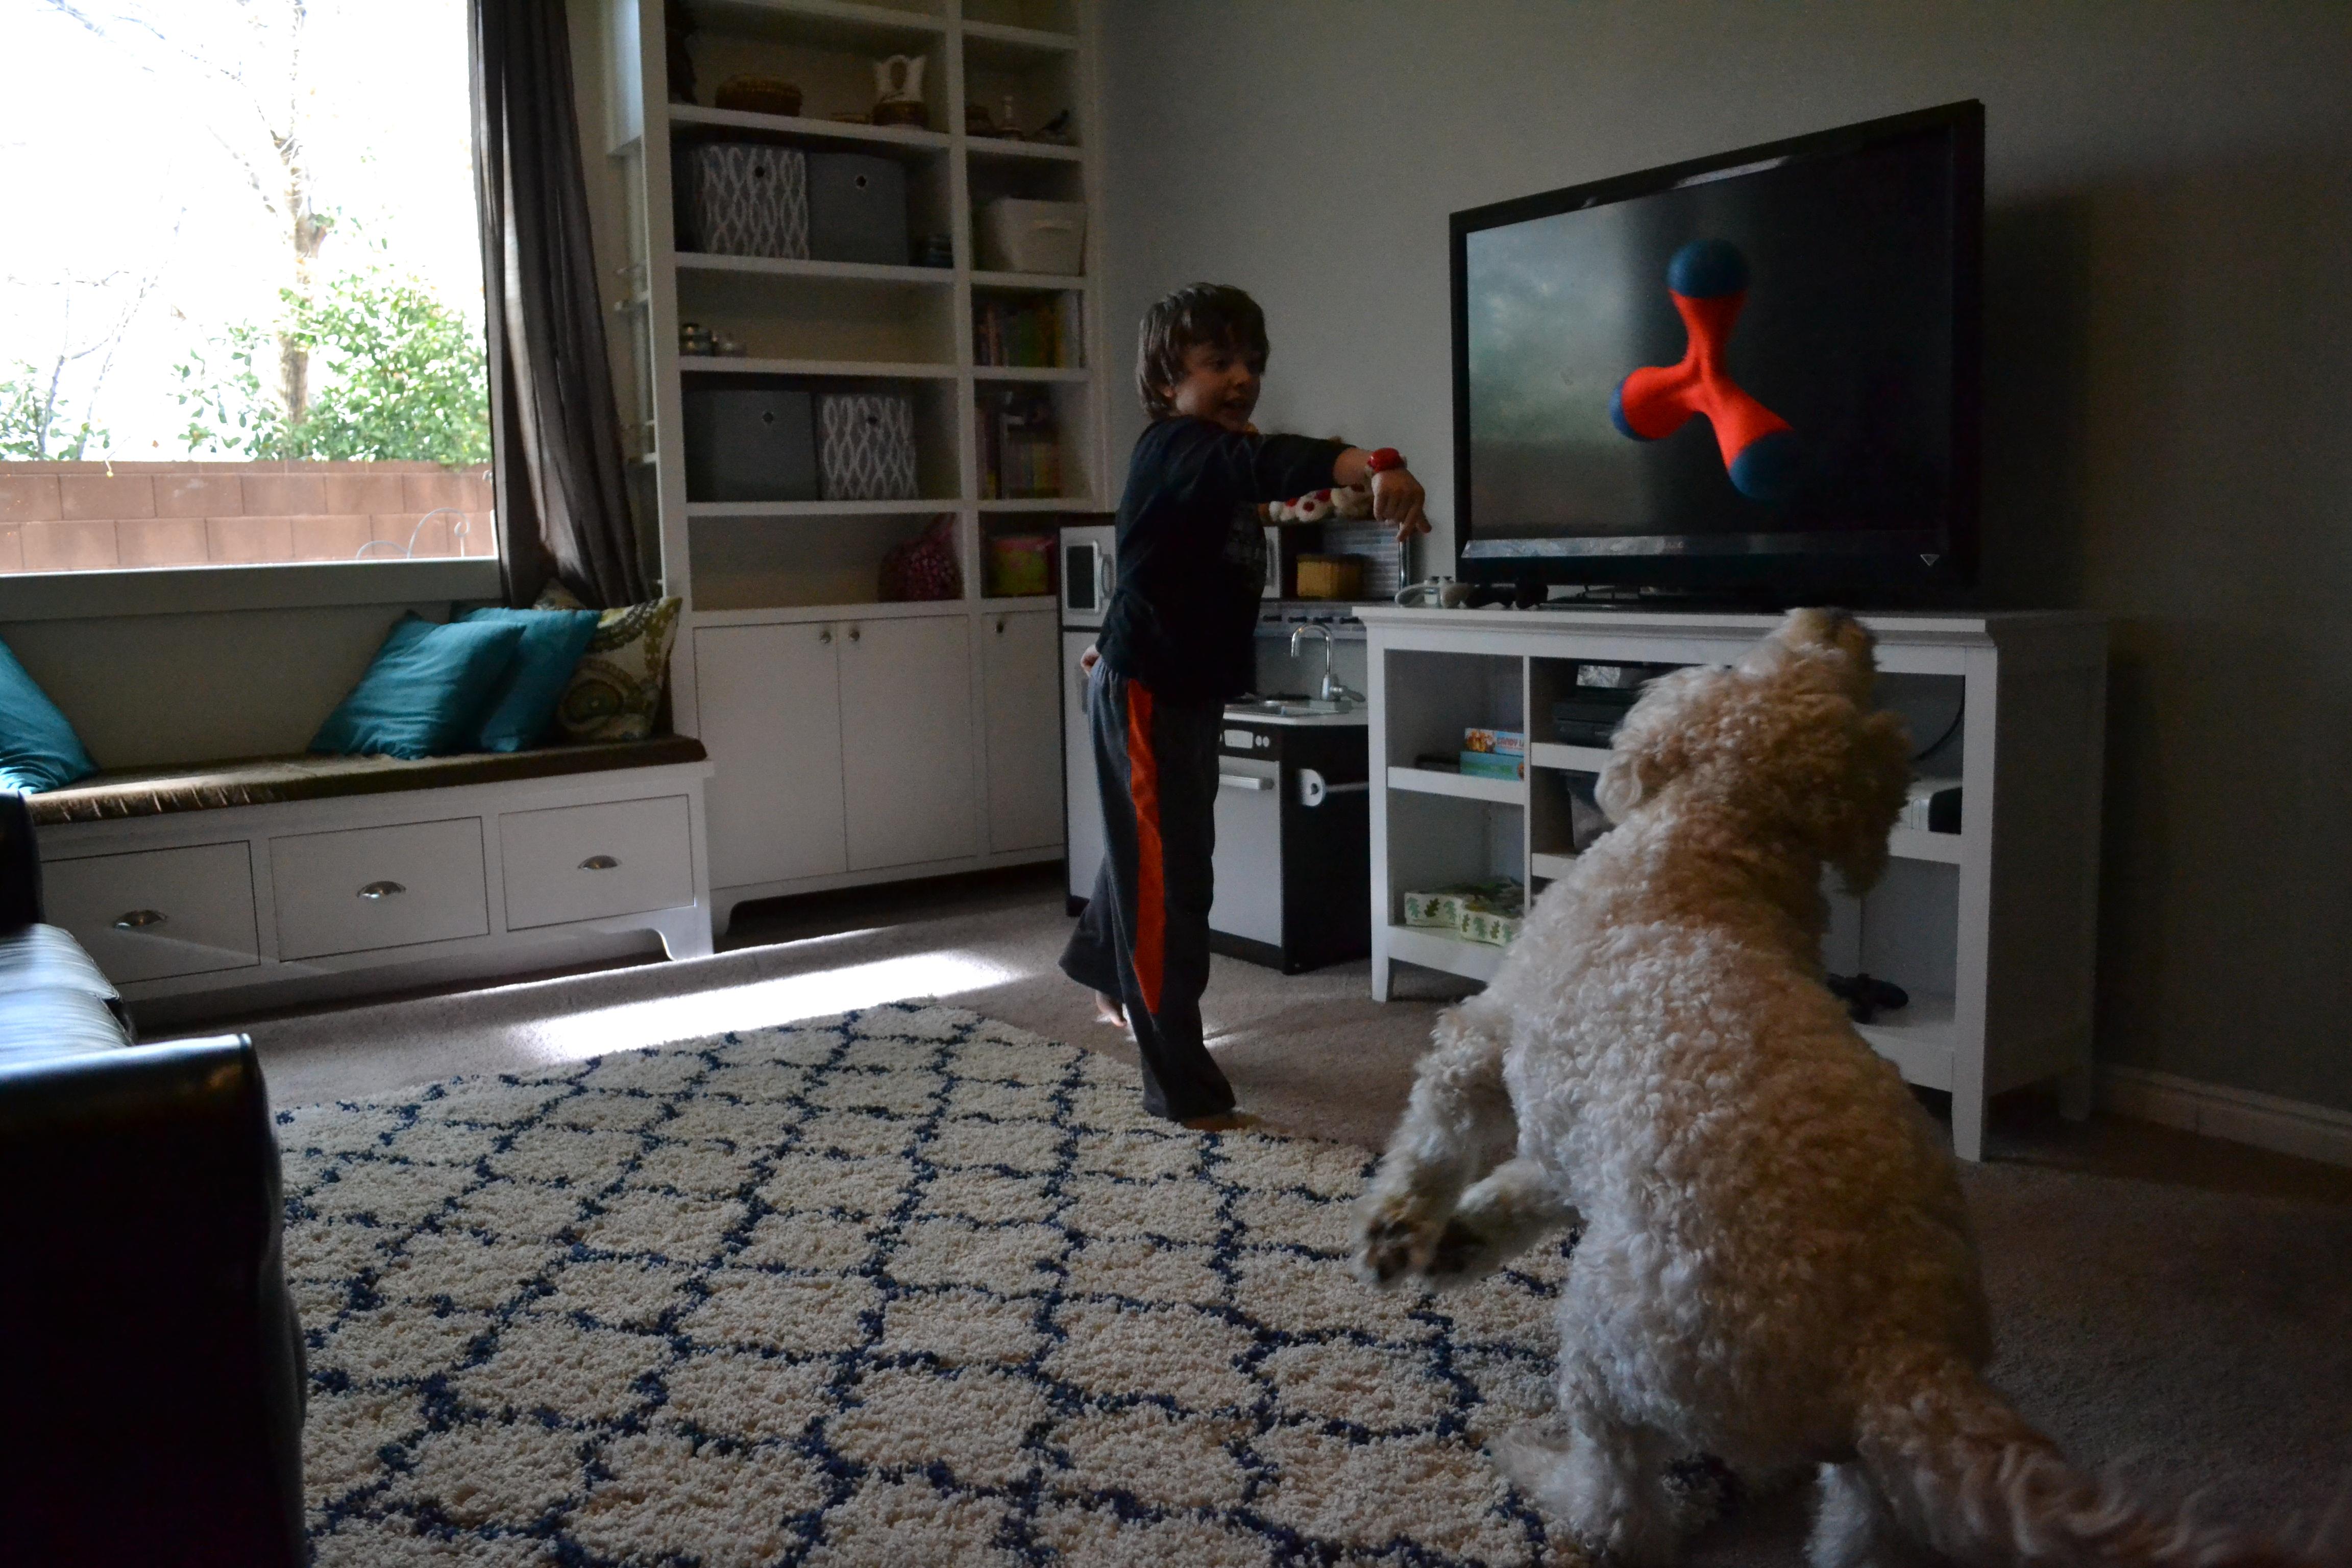 J.J. the service dog plays with Lucien Tucker, Washington, Utah, Dec. 16, 2016 | Photo by Joseph Witham, St. George News